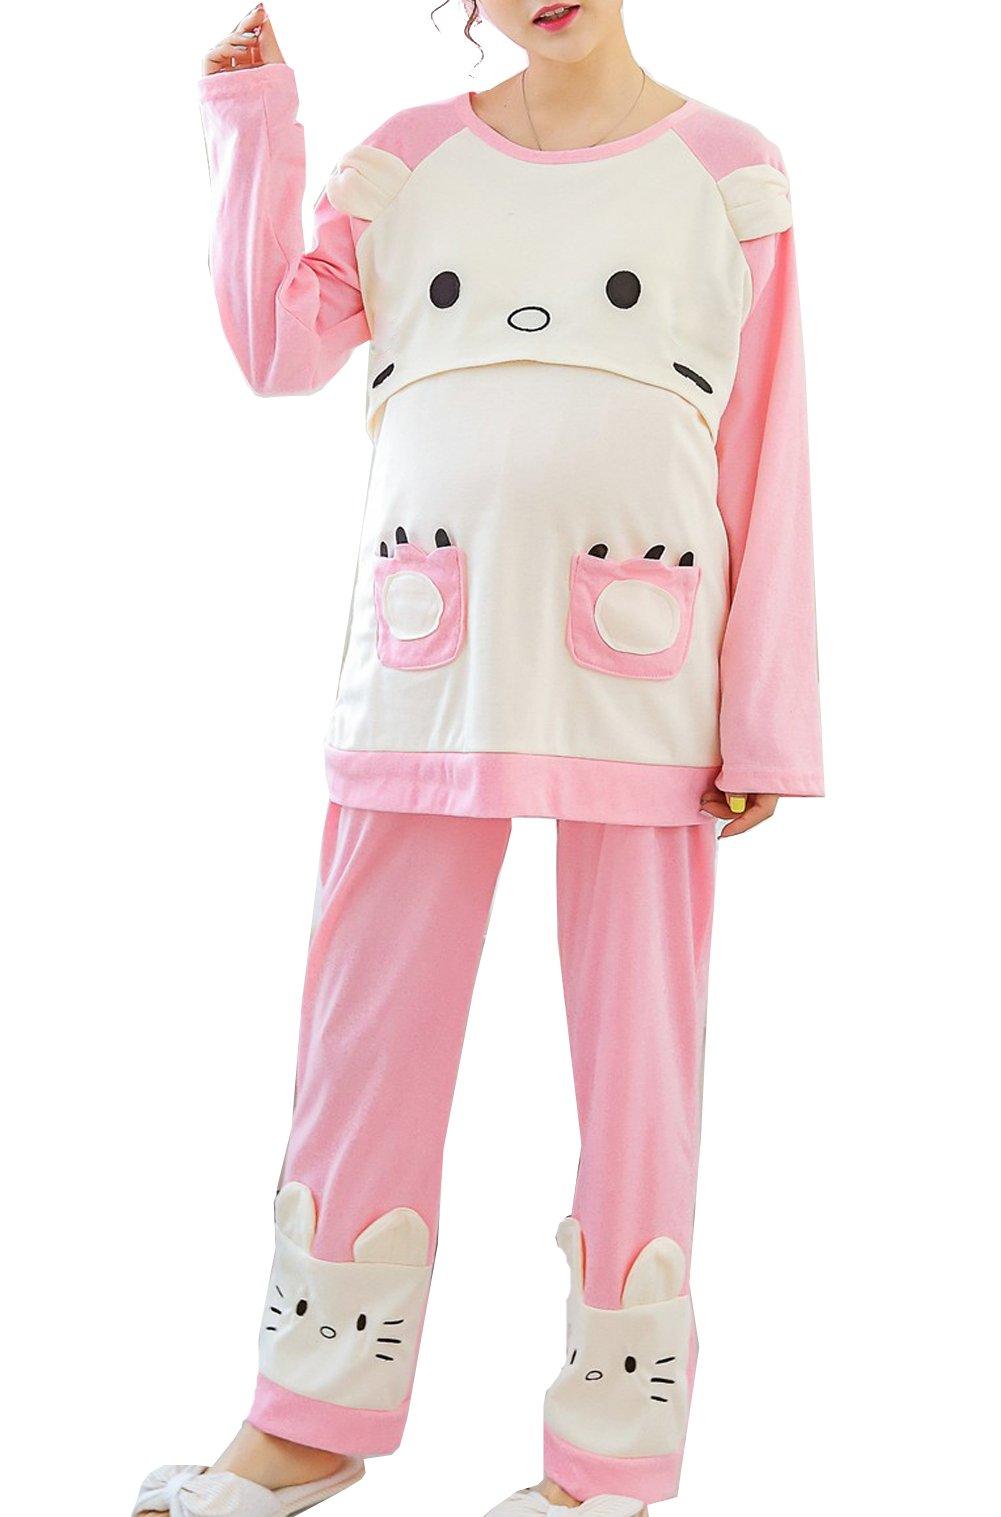 Women's Cute Cat Pattern Maternity Nursing Pajamas Set Breastfeeding Top and Pant, (Large)